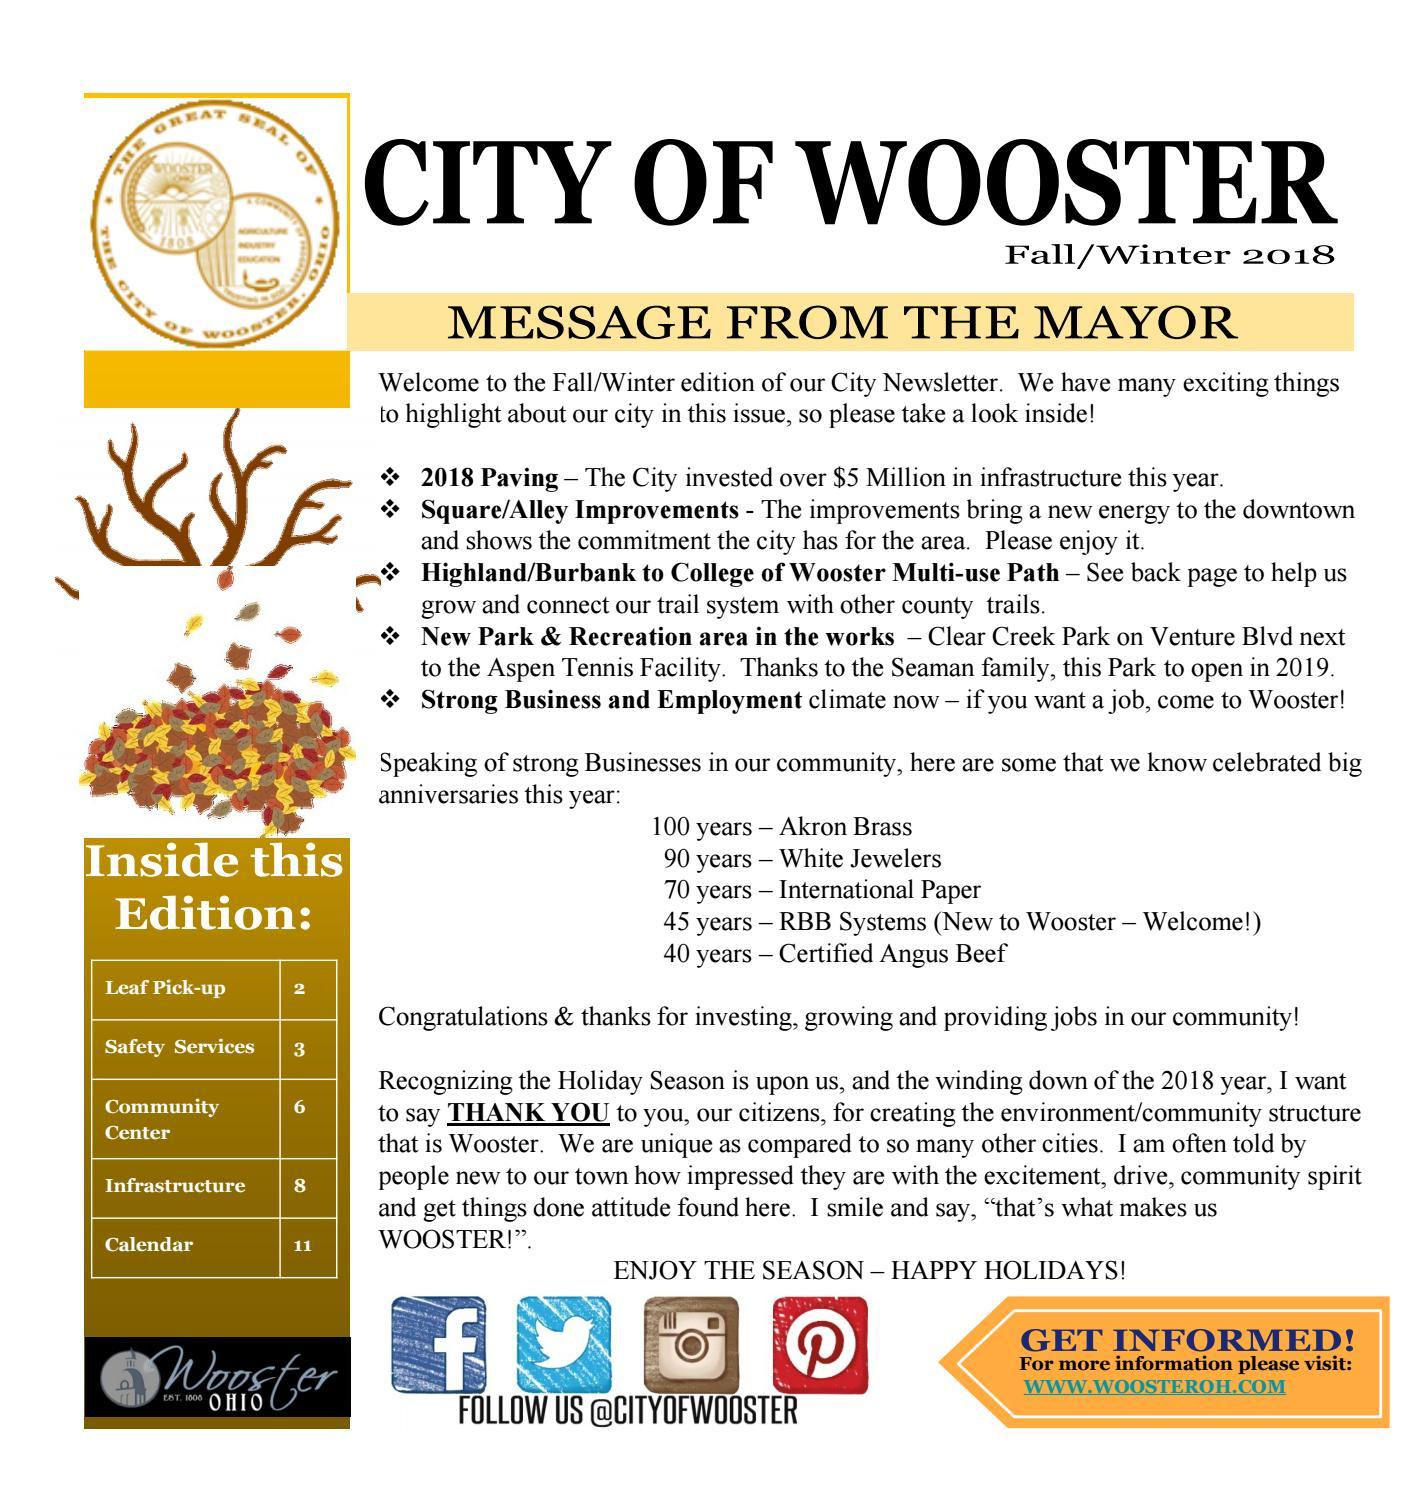 City Of Wooster Fall/winter 2018 Newslettergannett Neo